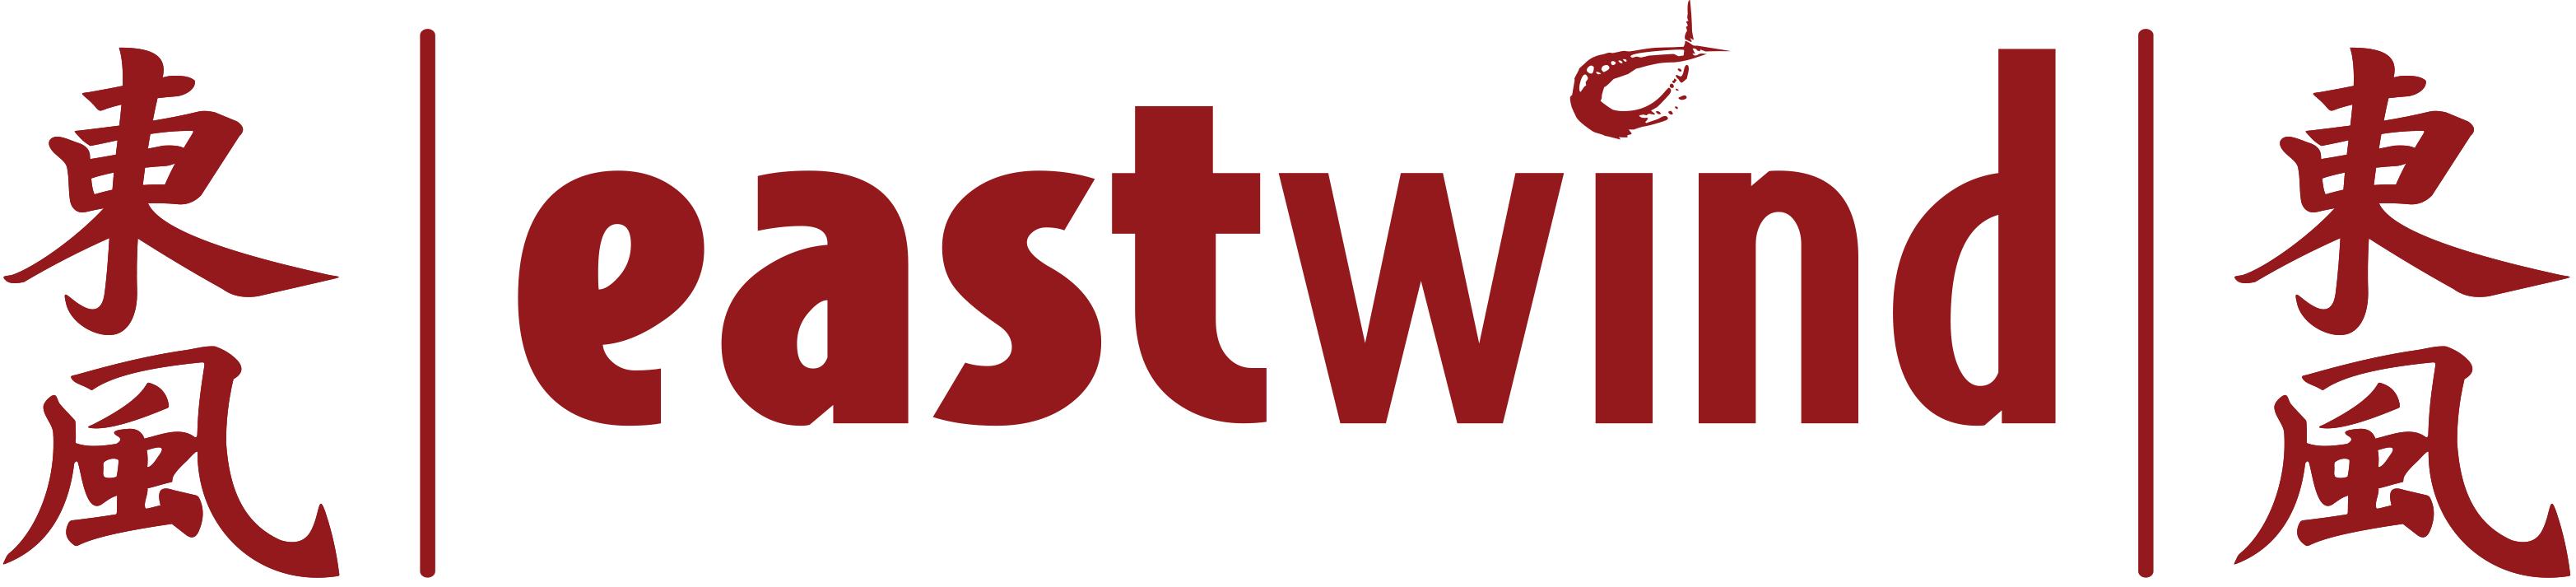 Eastwind_ResortsAC